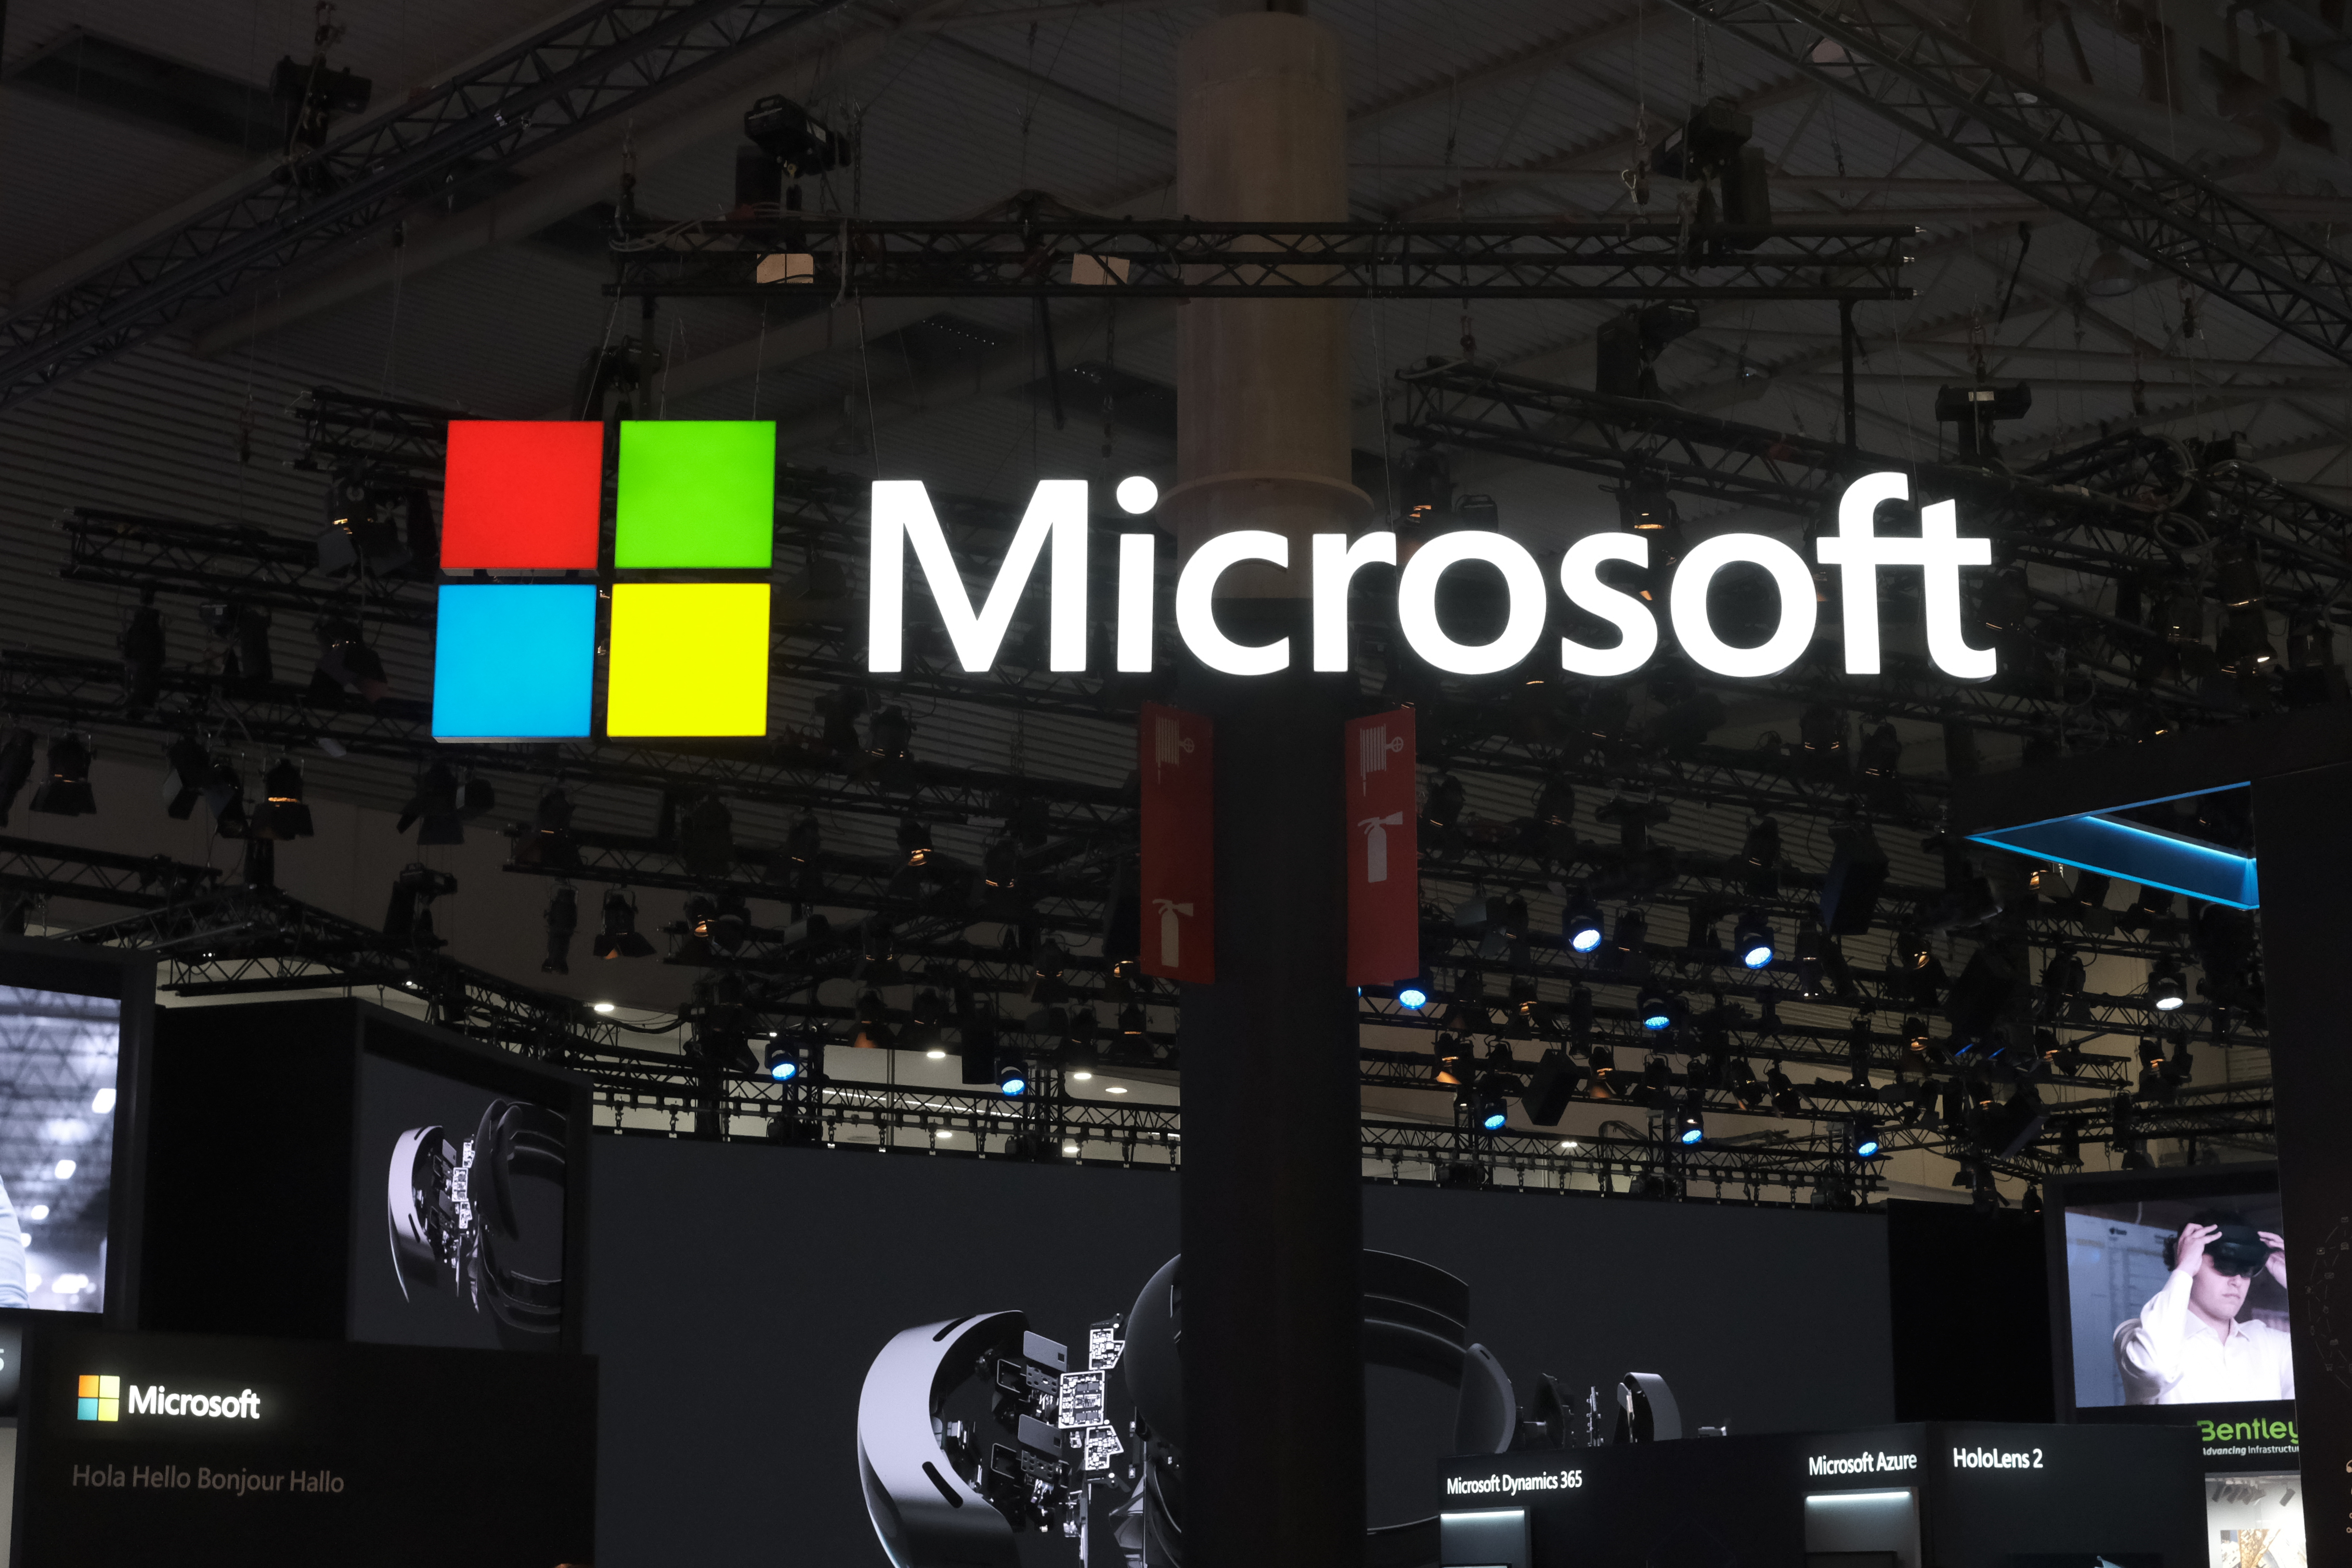 techcrunch.com - Frederic Lardinois - Microsoft Defender comes to the Mac